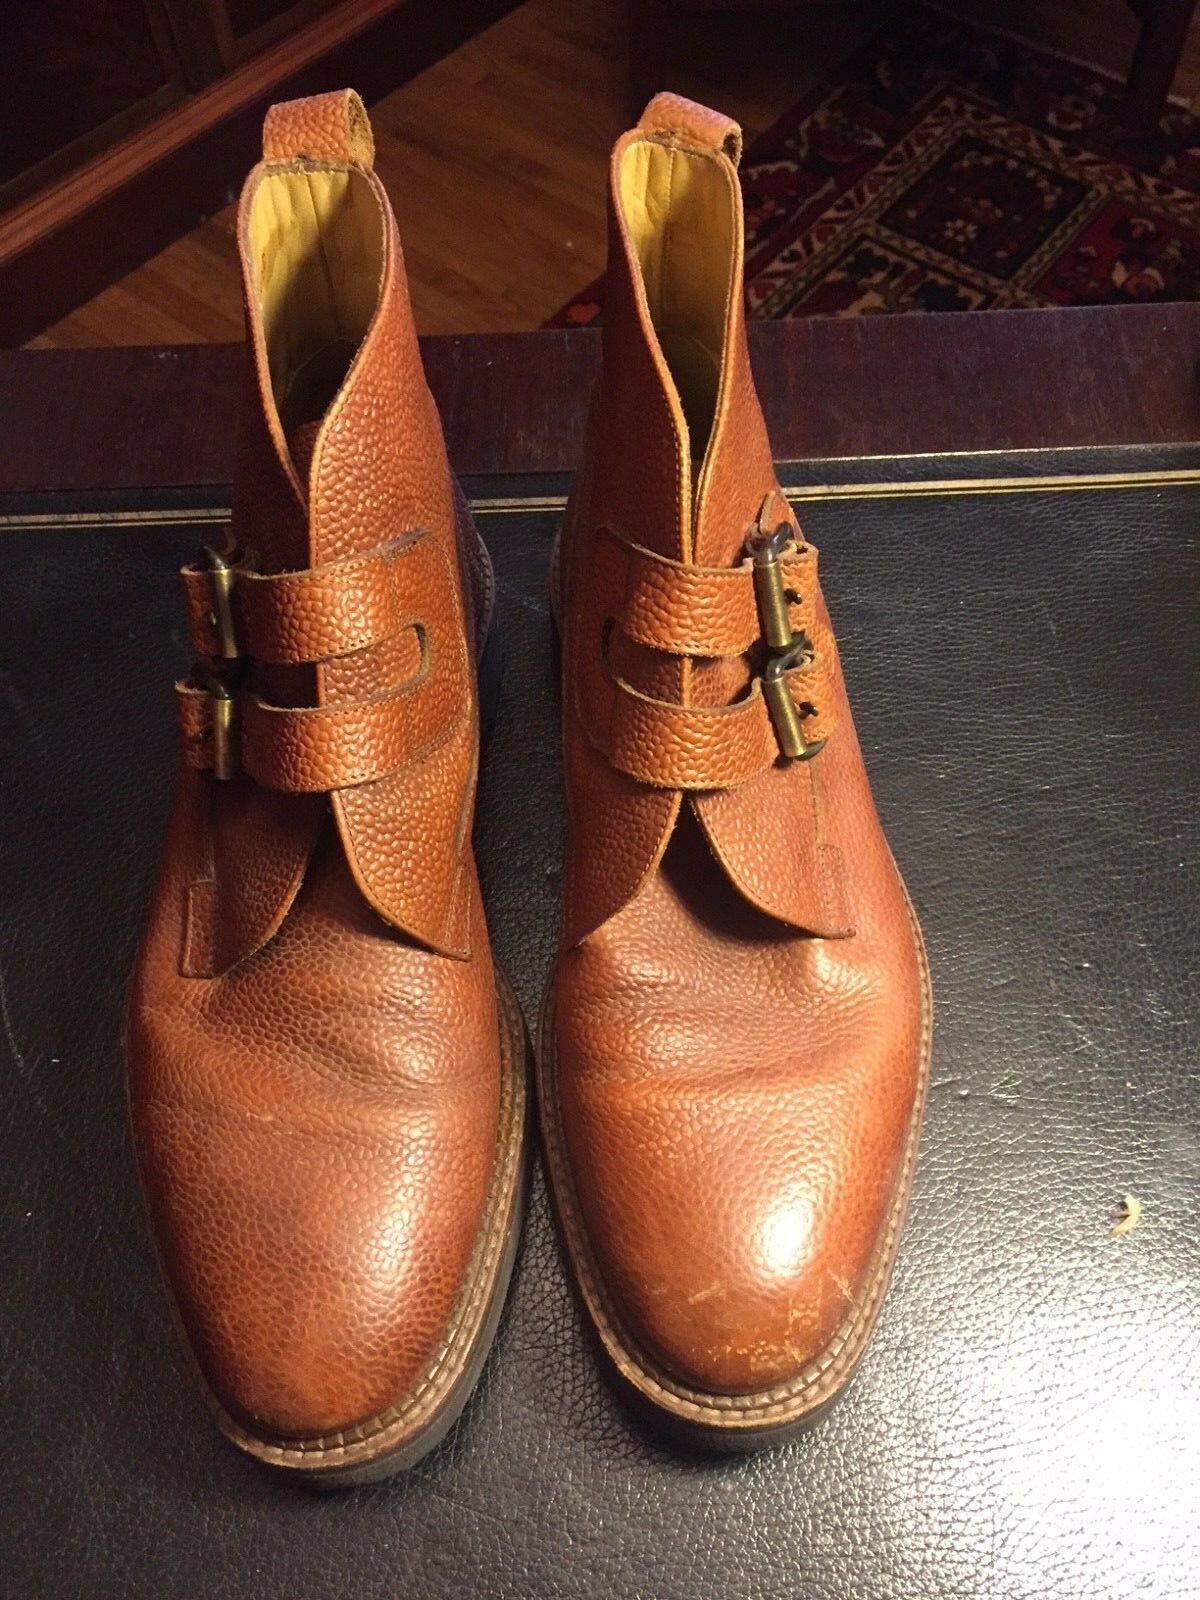 Polo Ralph Lauren Braun Leder Chukka Ankle Boot D  Uomo Größe 8.5 D Boot cd7148